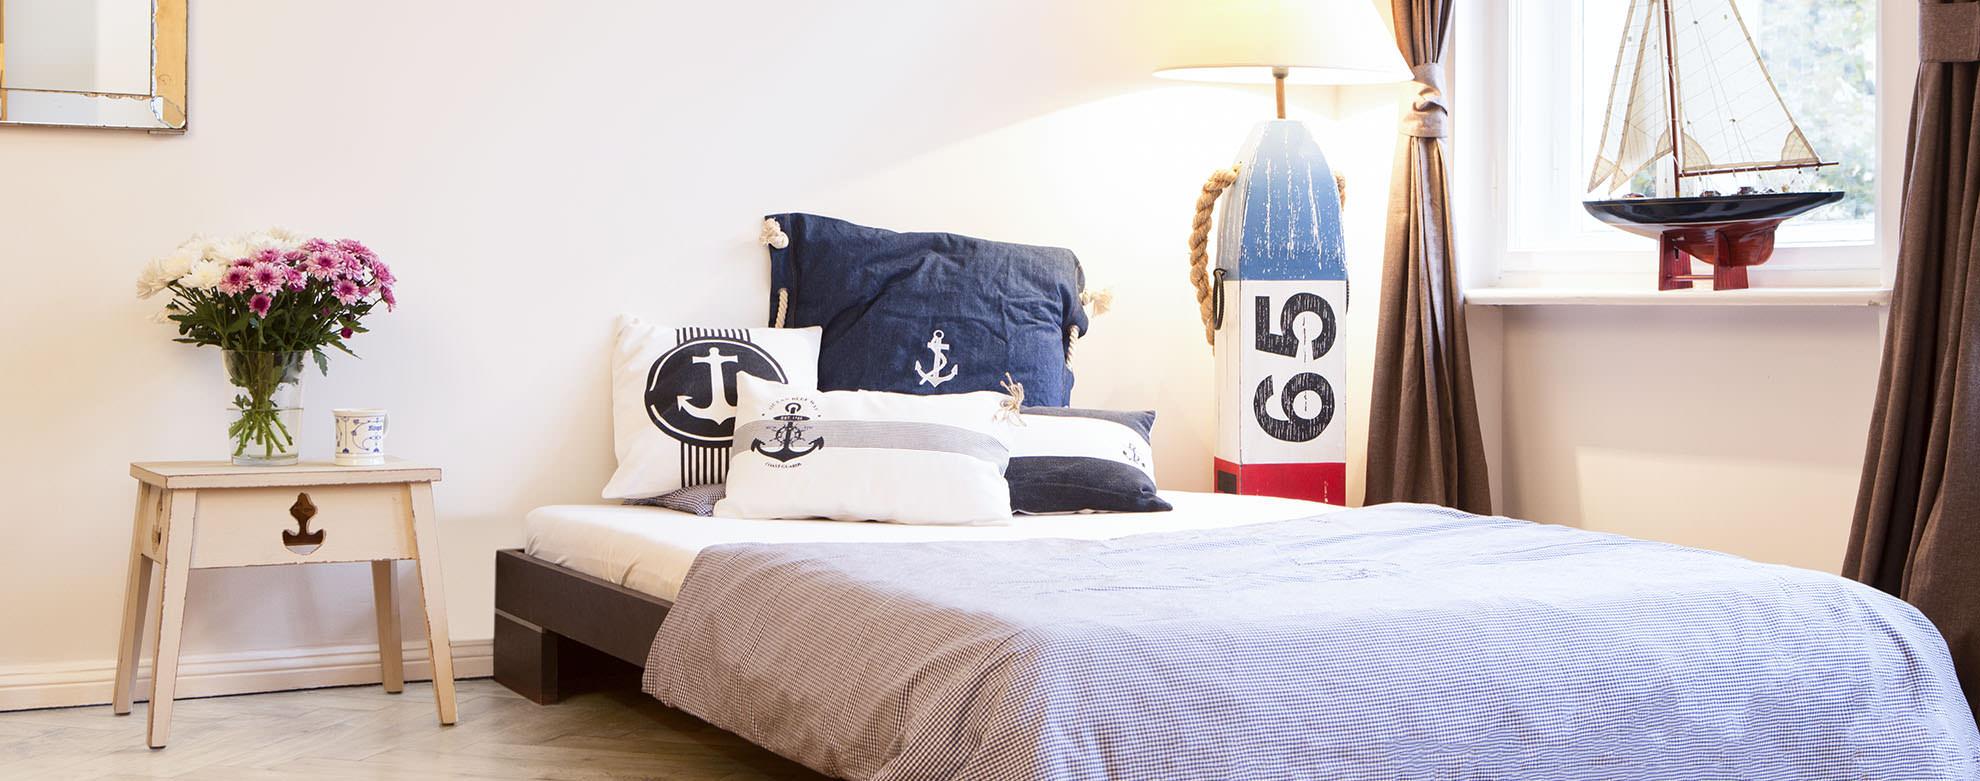 maritime m bel preiswert online bestellen mare me. Black Bedroom Furniture Sets. Home Design Ideas